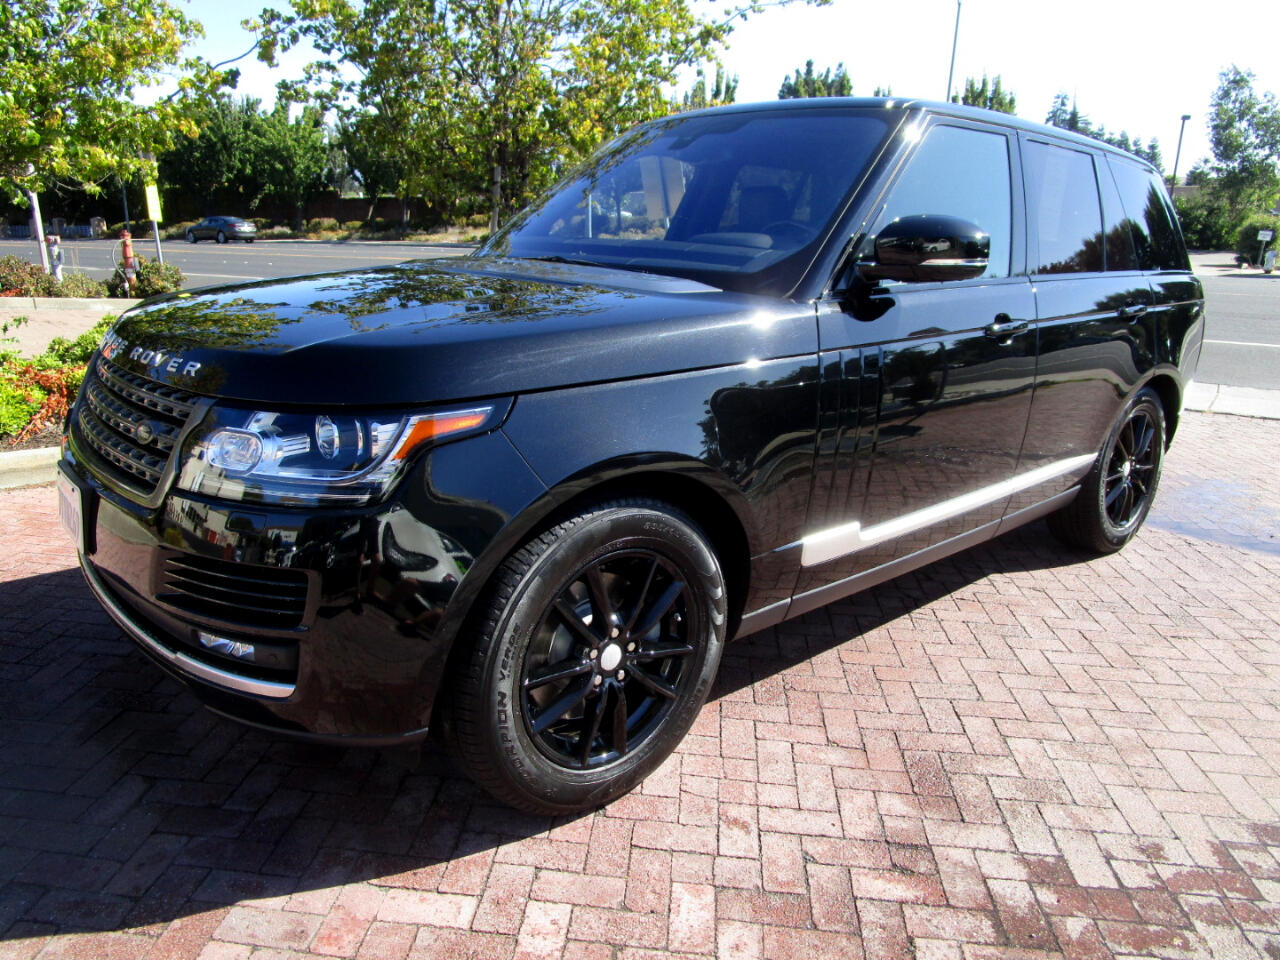 2016 Land Rover Range Rover TD6 SE DIESEL*HEAT SEATS/STR WHL*BLIND SPOT*360 CA